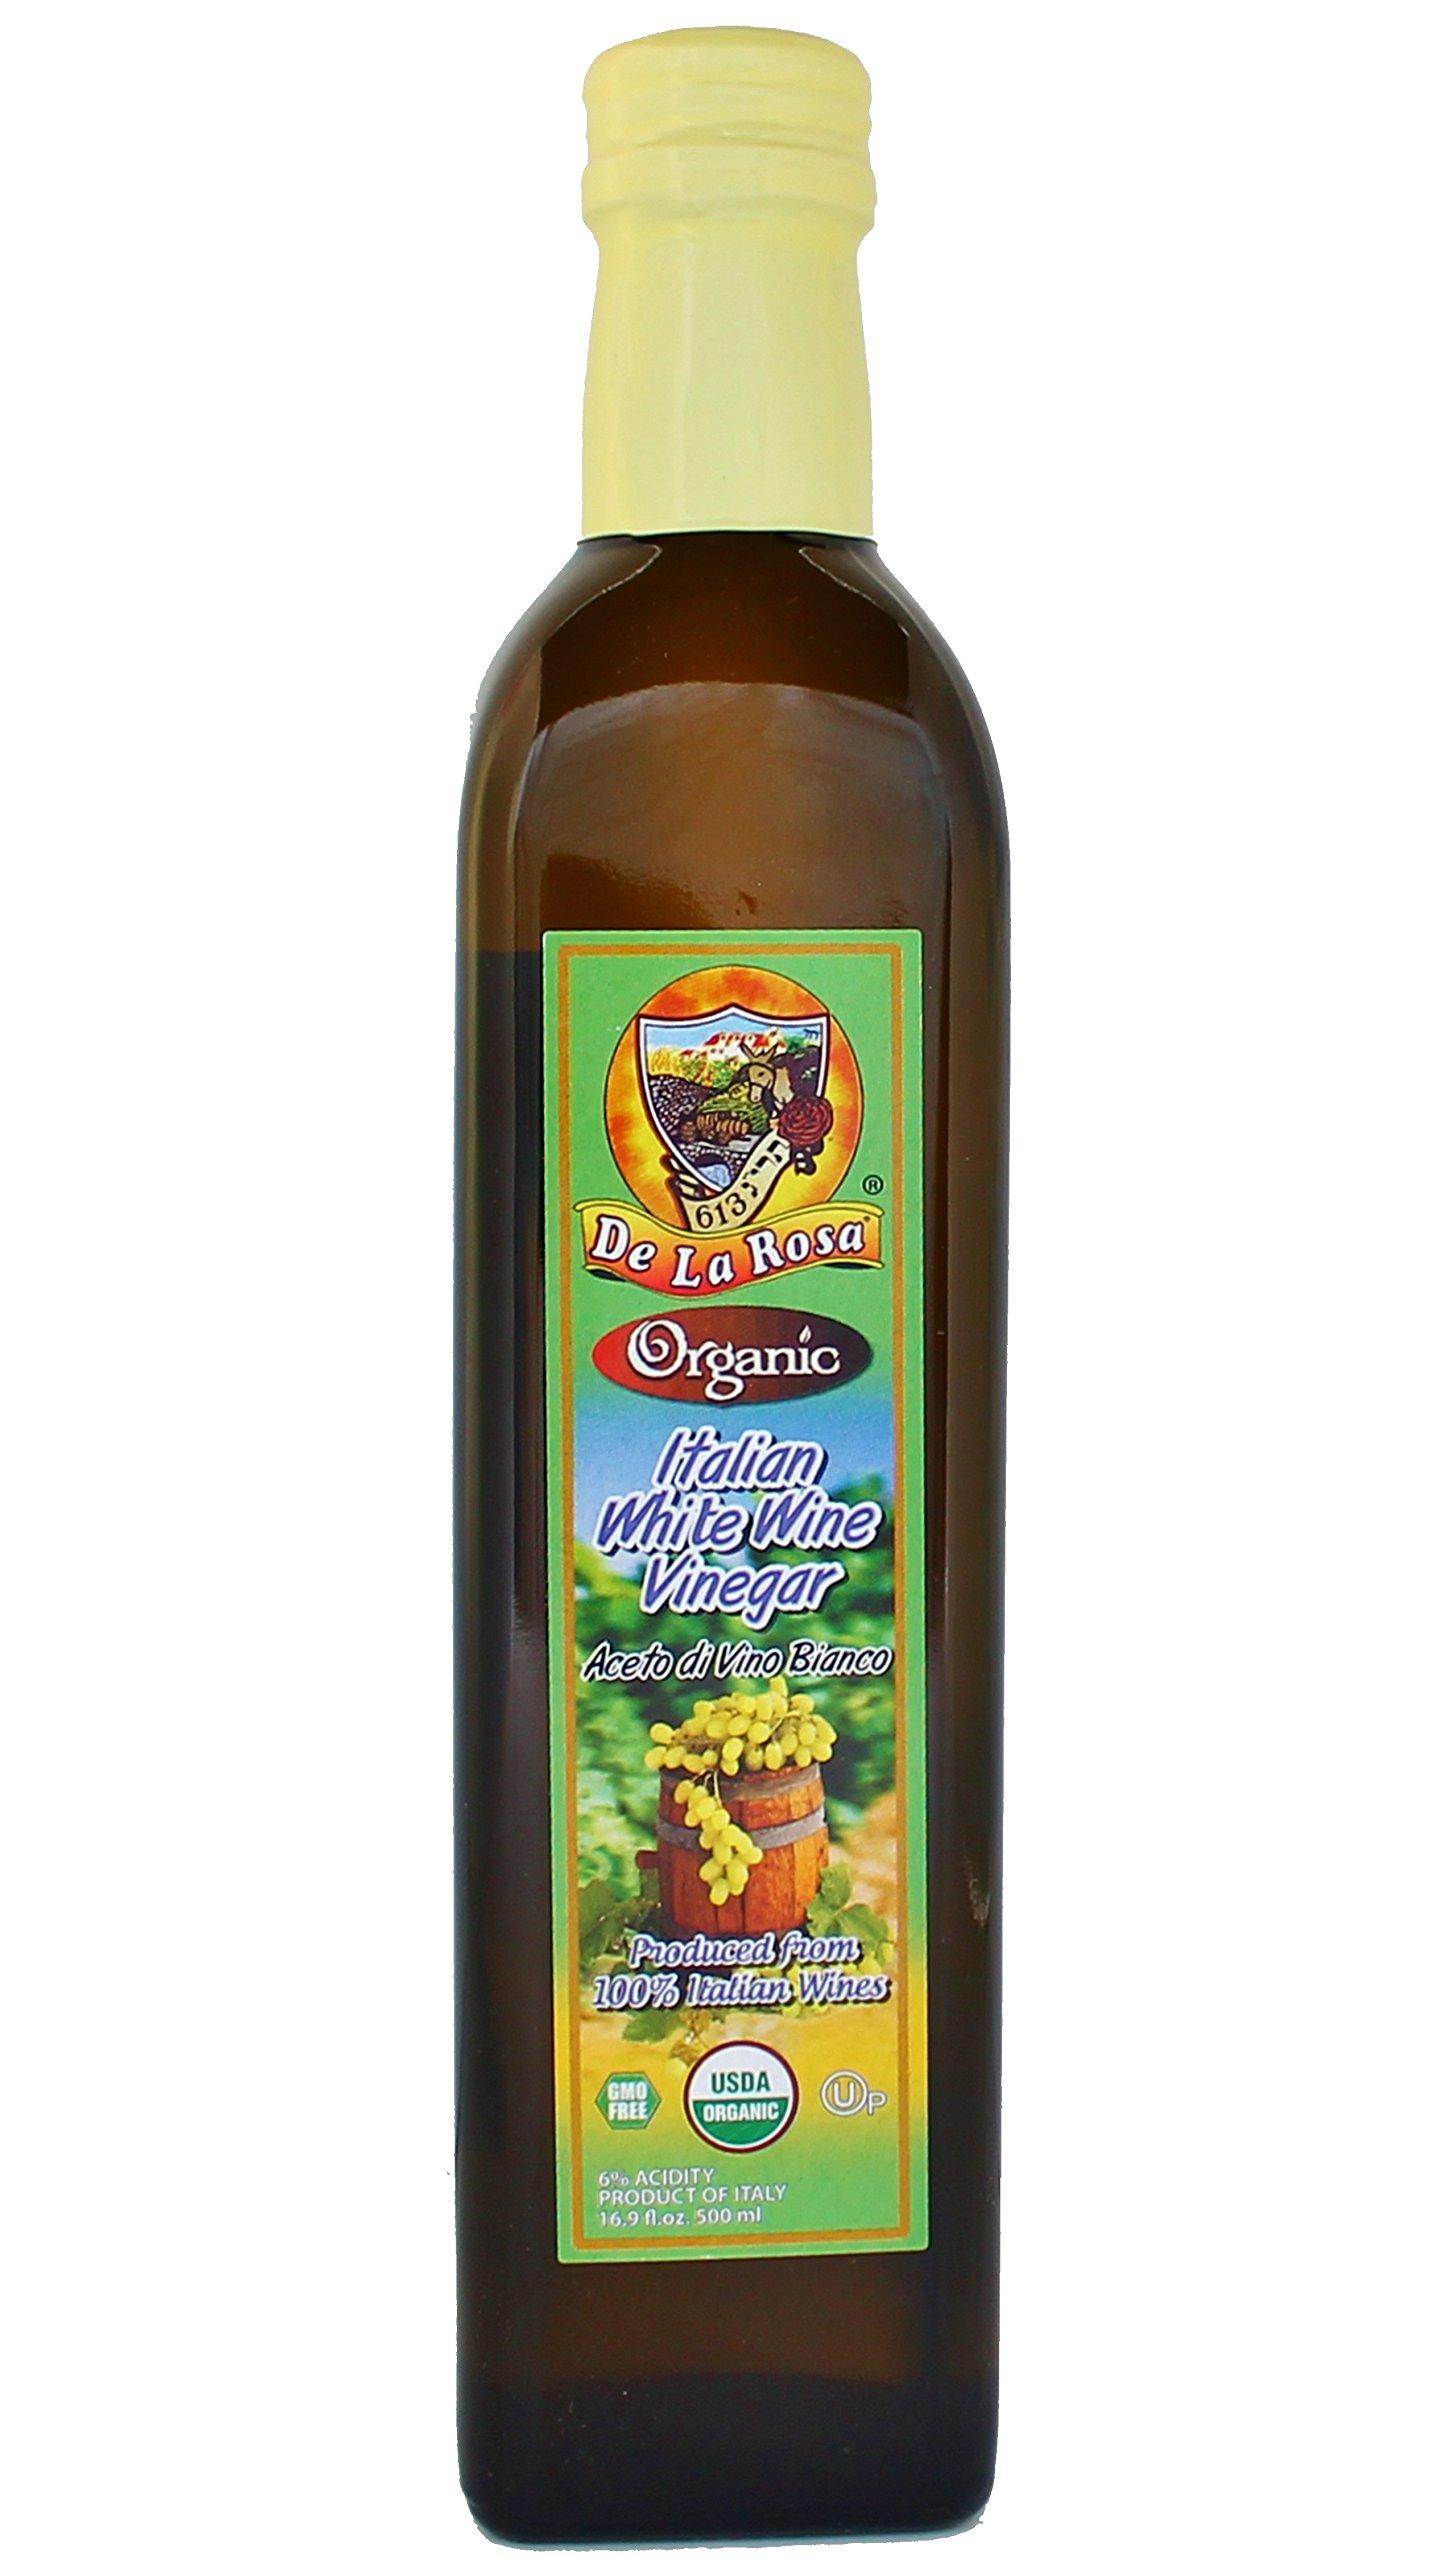 De La Rosa Real Foods & Vineyards - Organic Italian White Wine Vinegar (16.9 oz/500 ml)